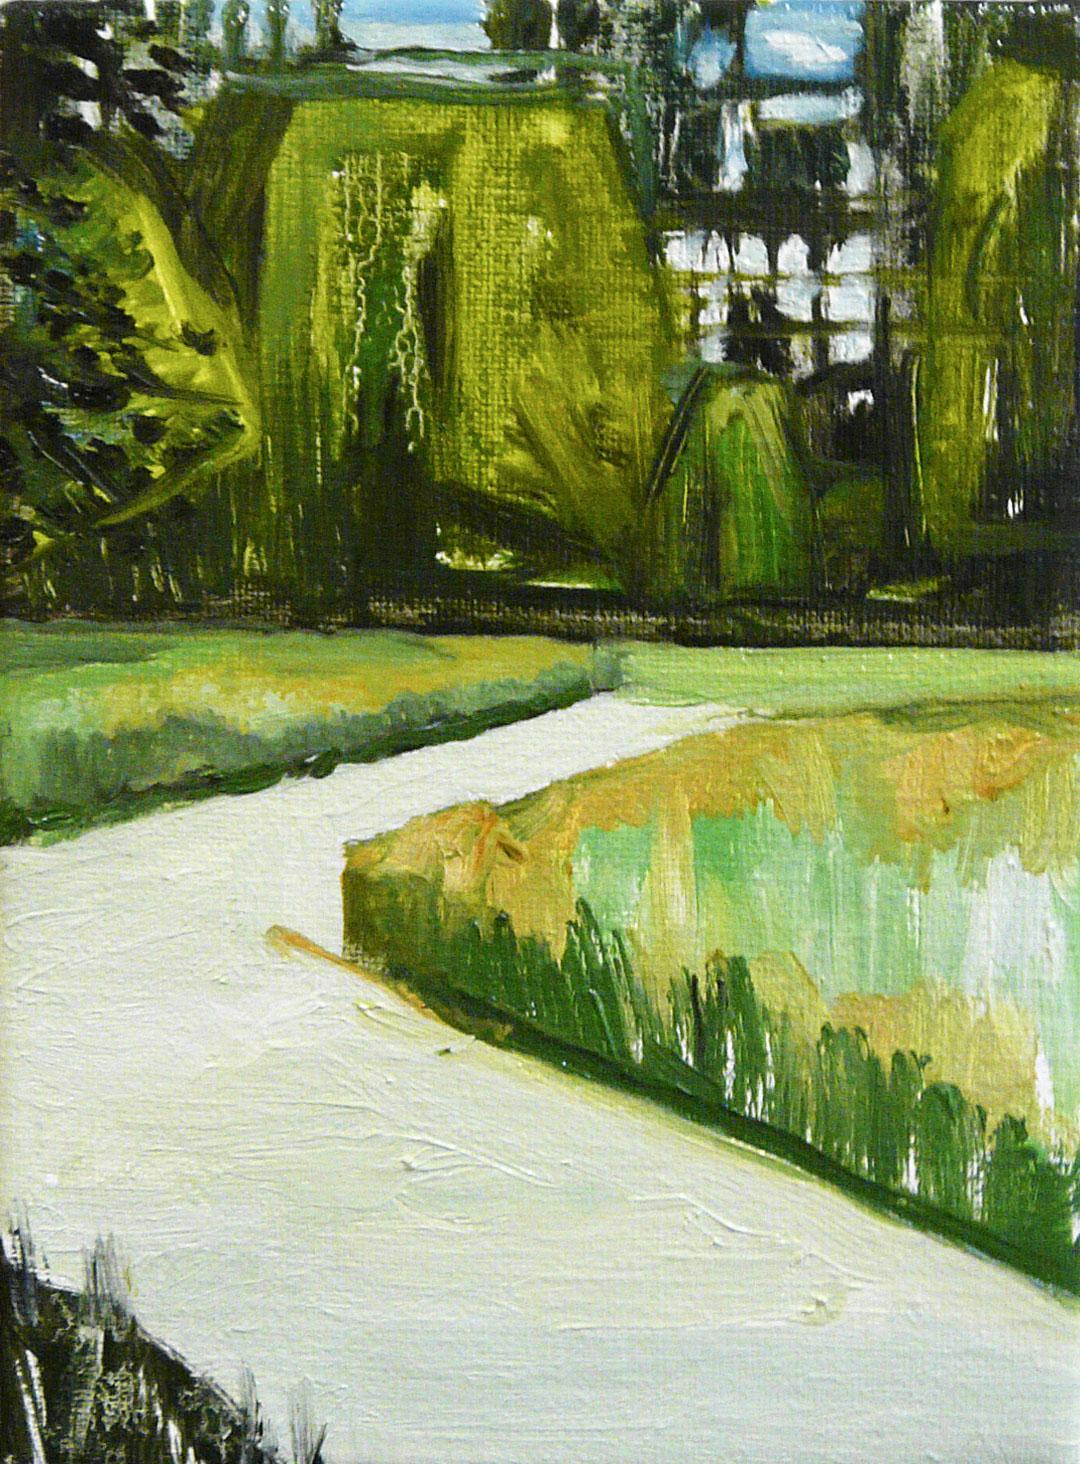 Green Landscape 7-10_2015_20 x 14cm